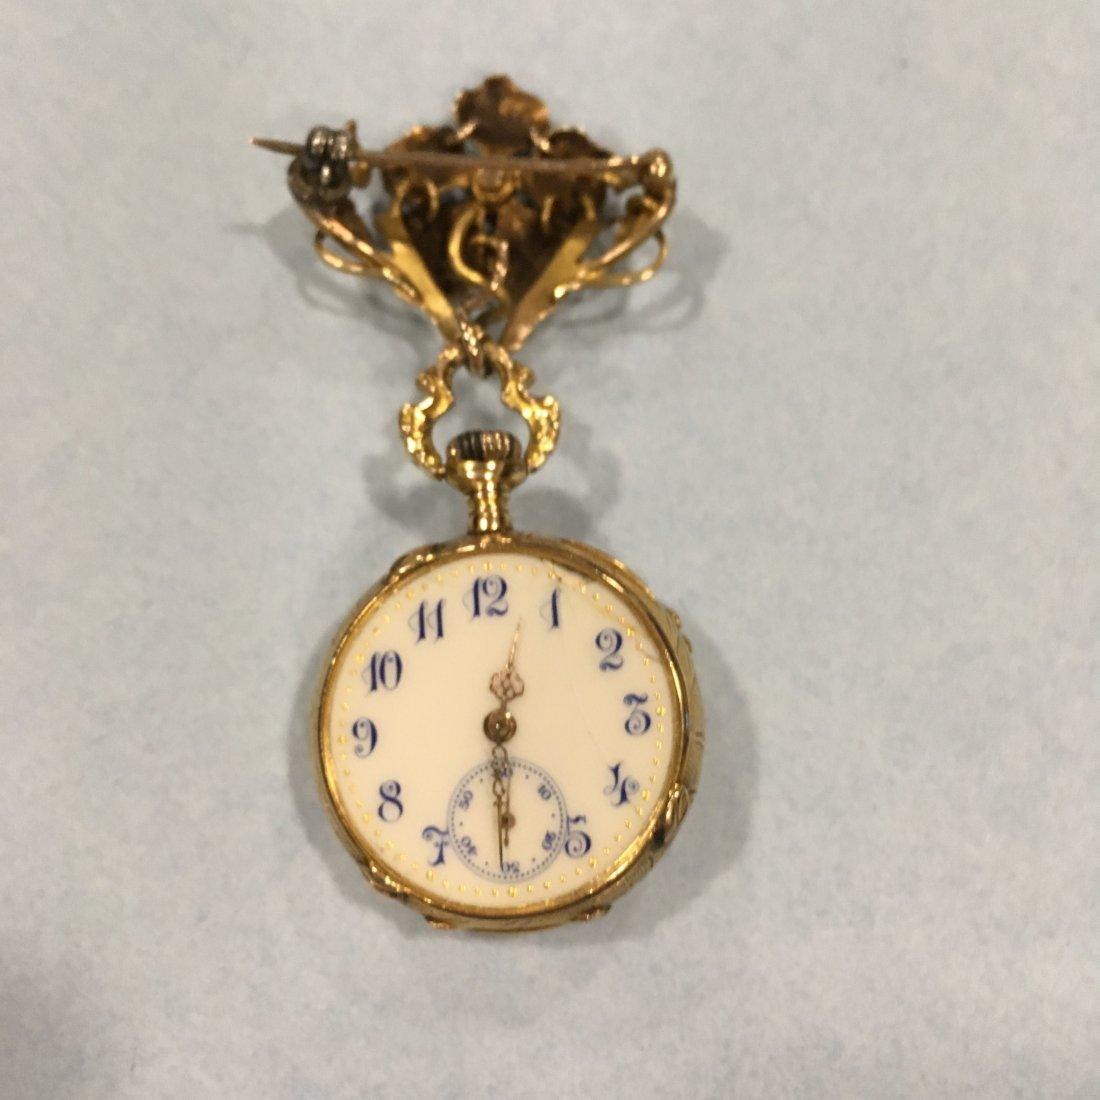 Art Nouveau Lady's 14K Diamond Pendant Watch - 2